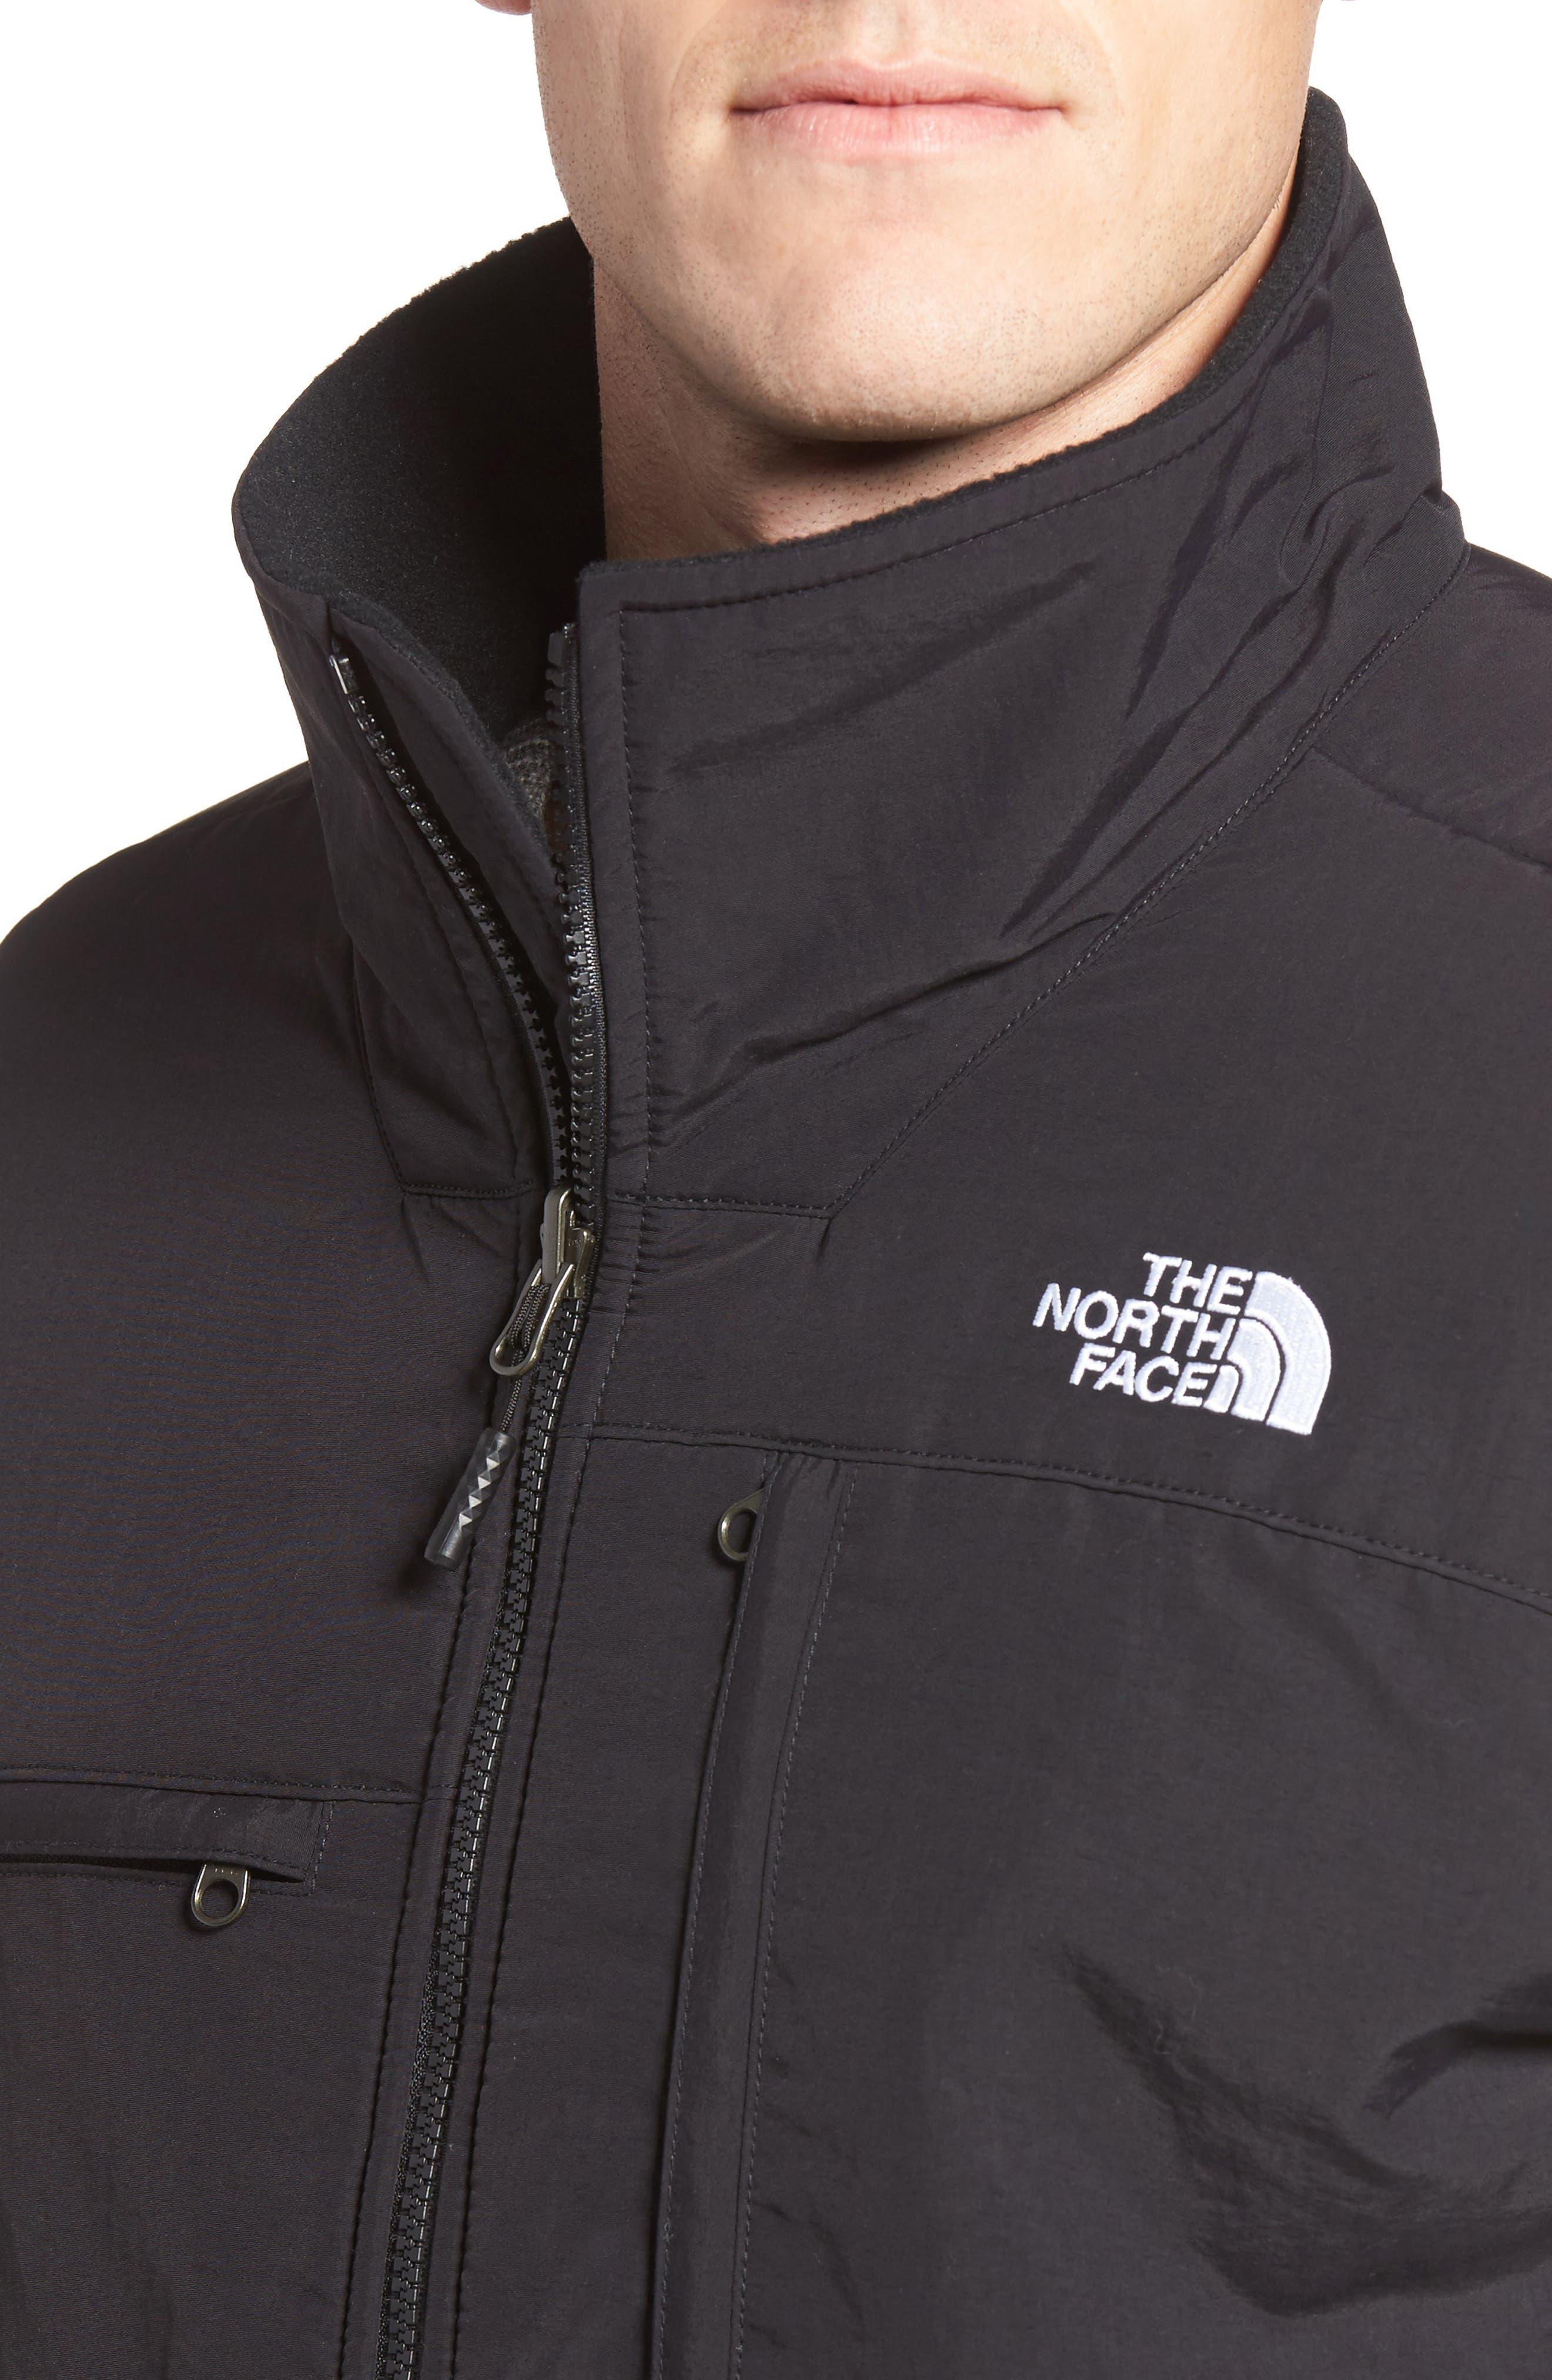 Denali 2 Recycled Fleece Jacket,                             Alternate thumbnail 5, color,                             001